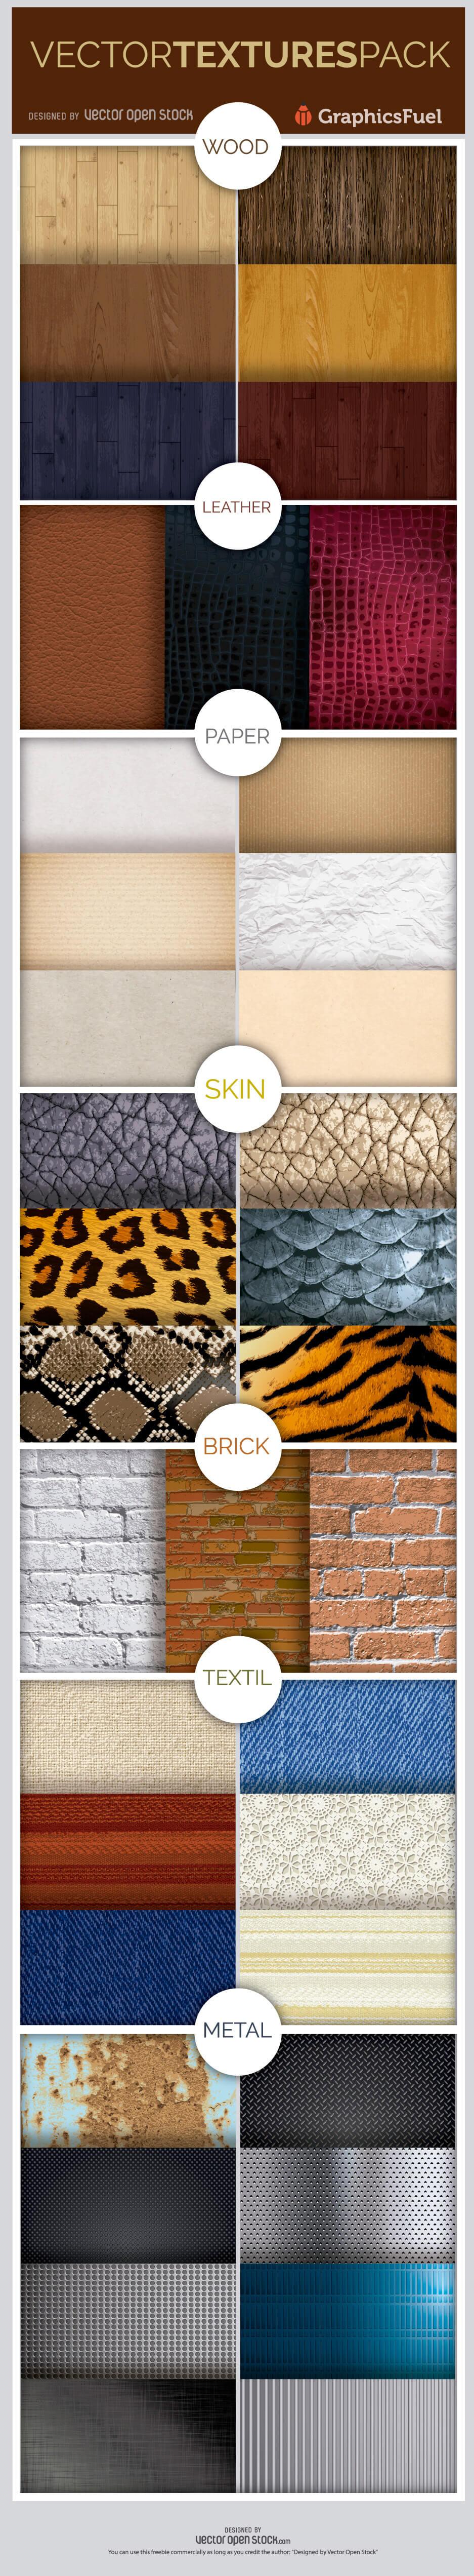 Free Vector Textures